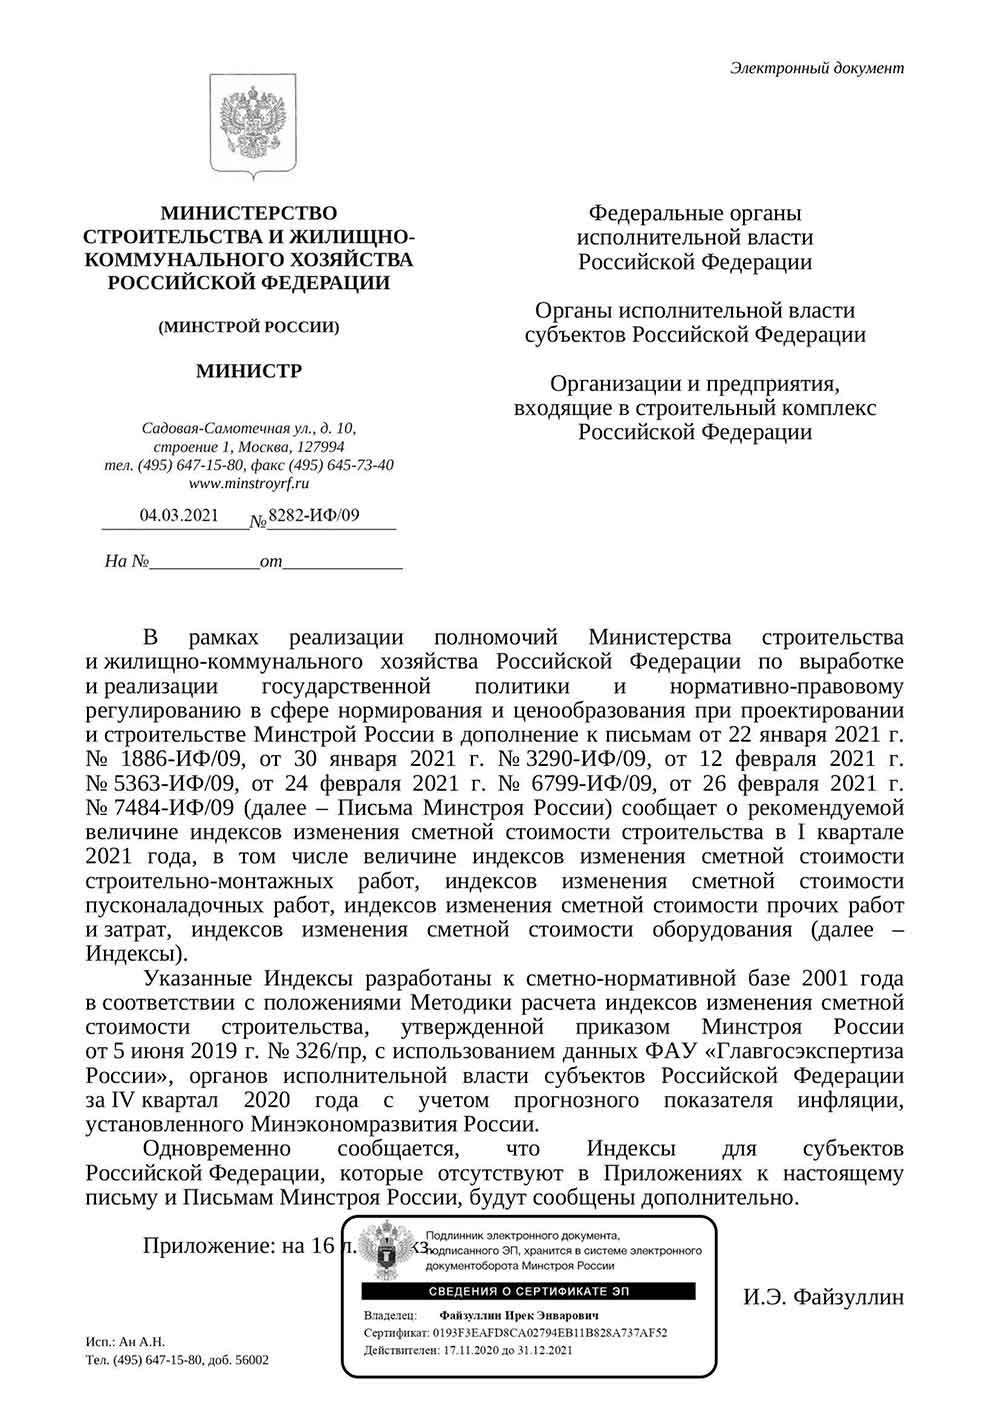 Письмо Минстроя РФ №8282-ИФ/09 от 04.03.2021 г.